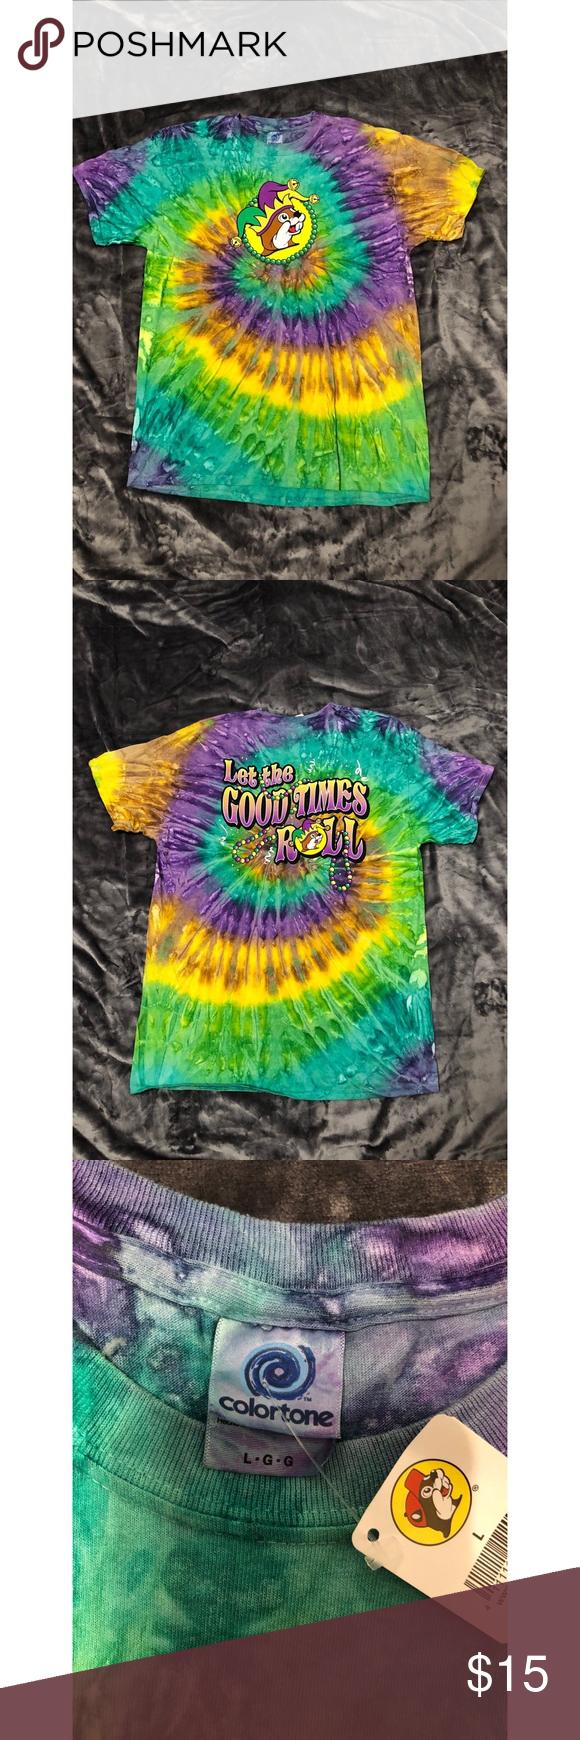 6cc99e9c8cdfe Buc-ee's Mardi Gras Tie Die T-shirt ‼️NEVER WORN‼️ Buc-ee's Tie ...